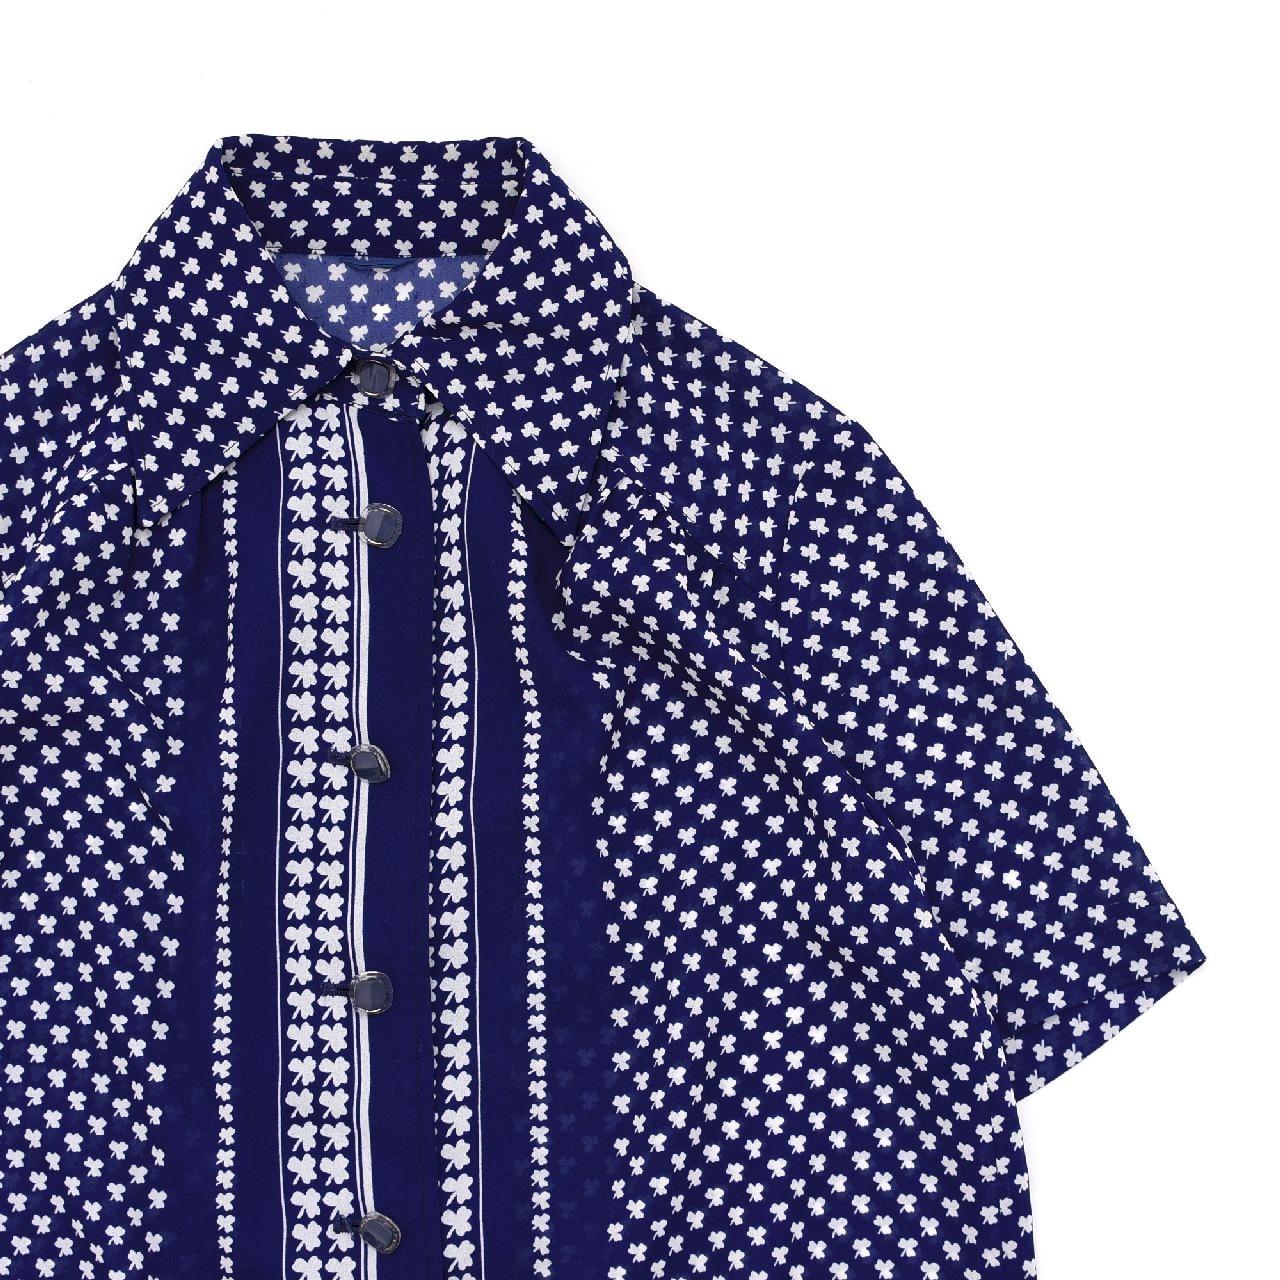 Clover pattern georgette retro blouse